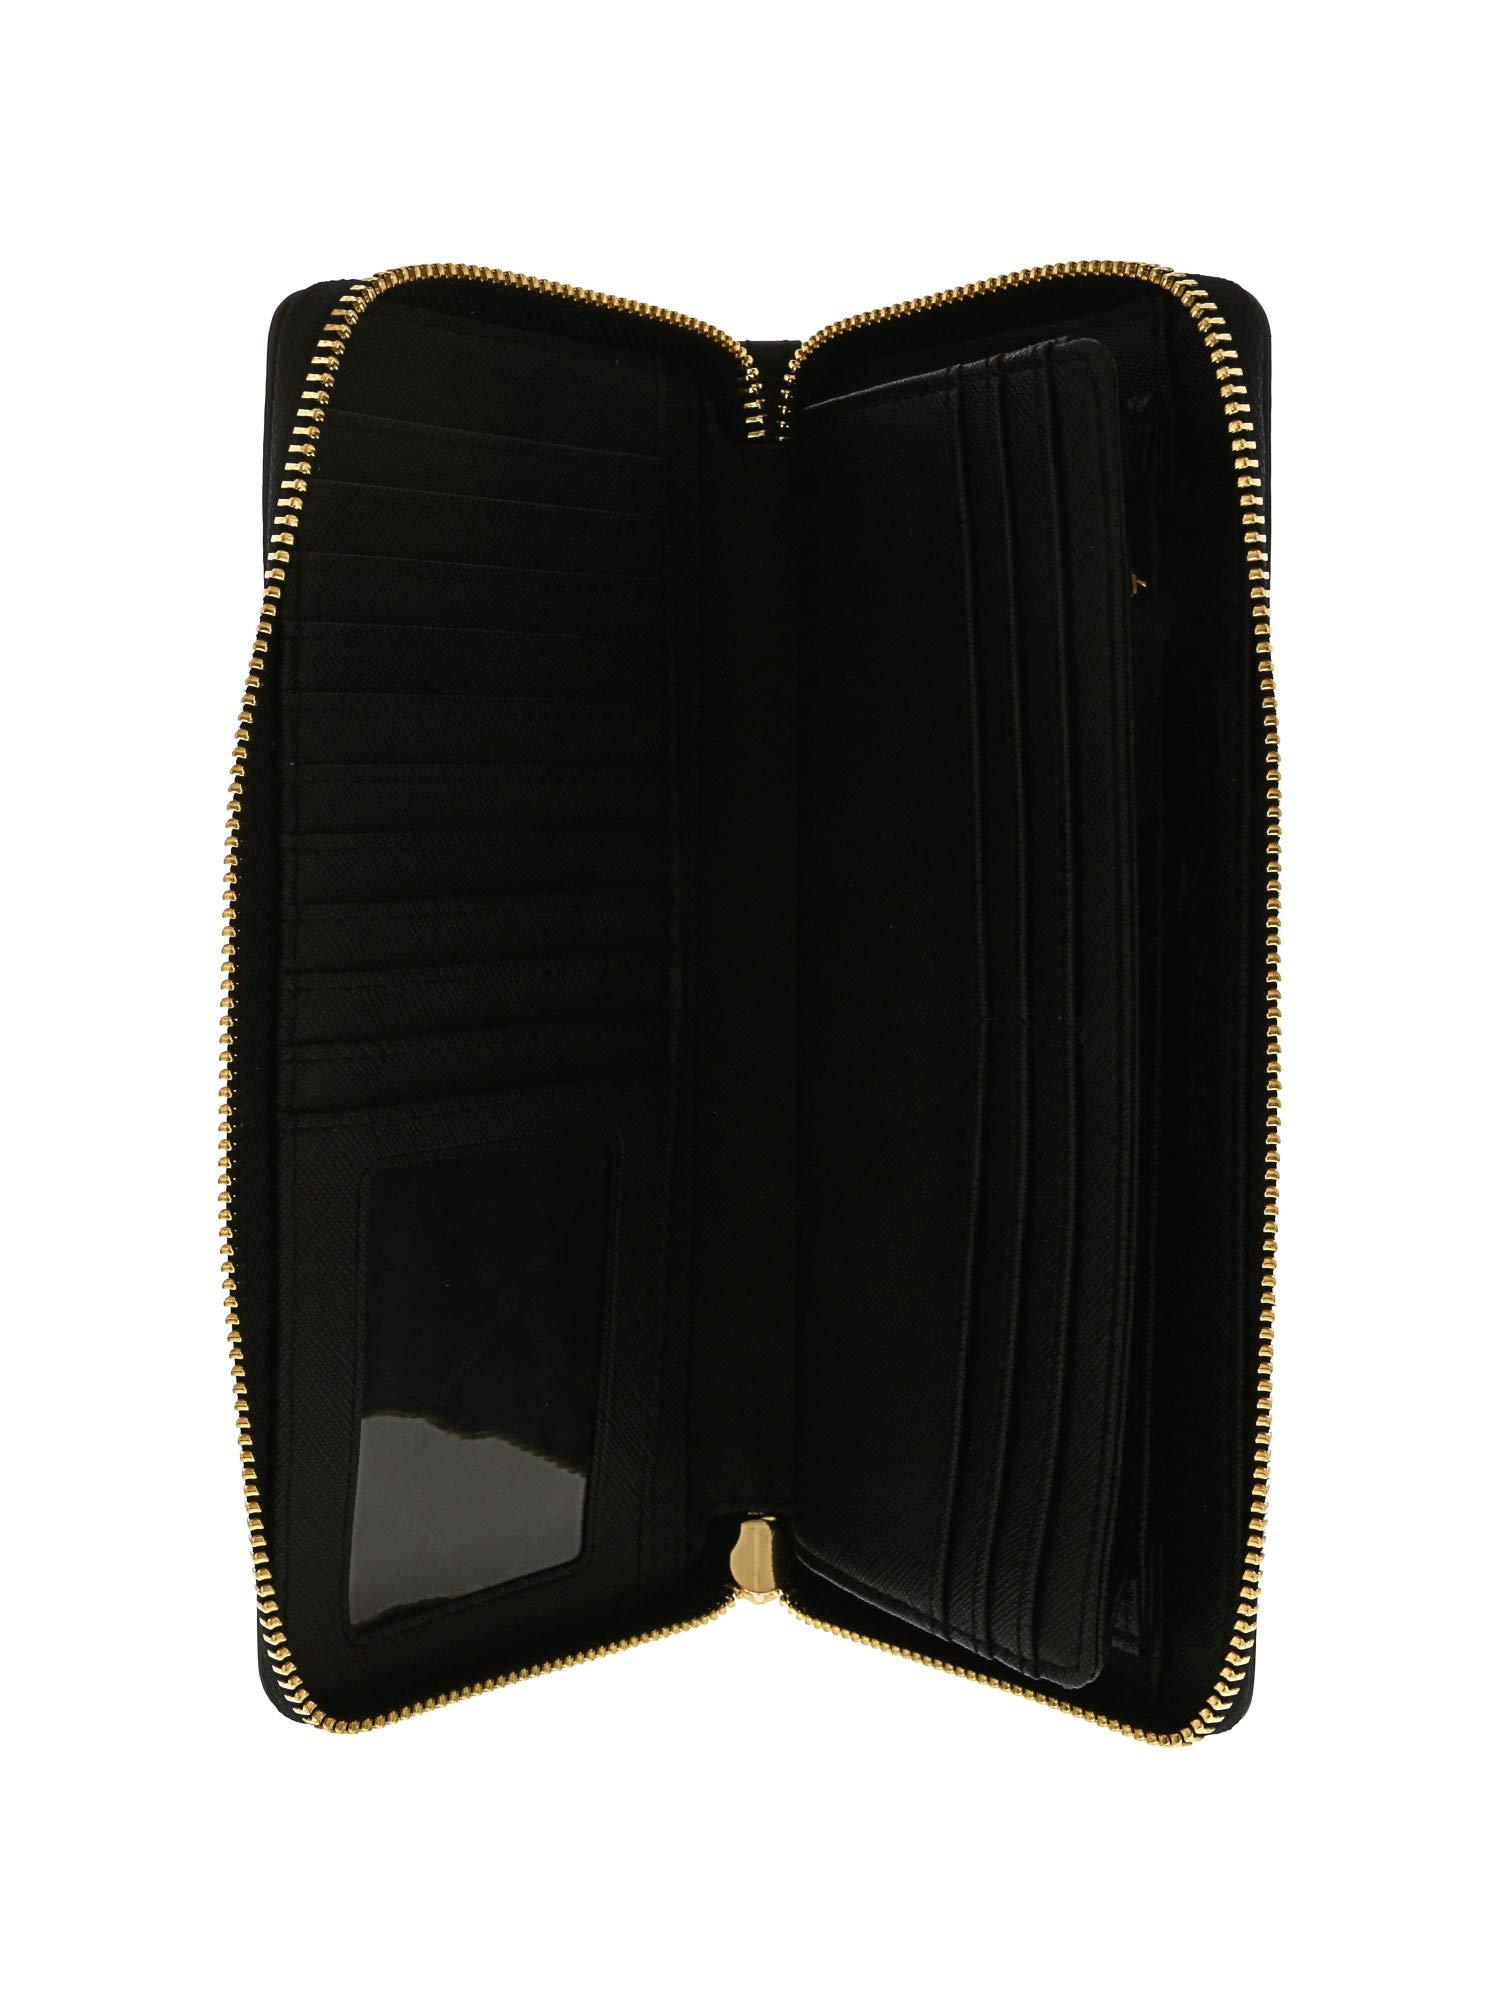 Michael Kors Jet Set Travel Continental Leather Wallet/Wristlet - Black/Gold by Michael Kors